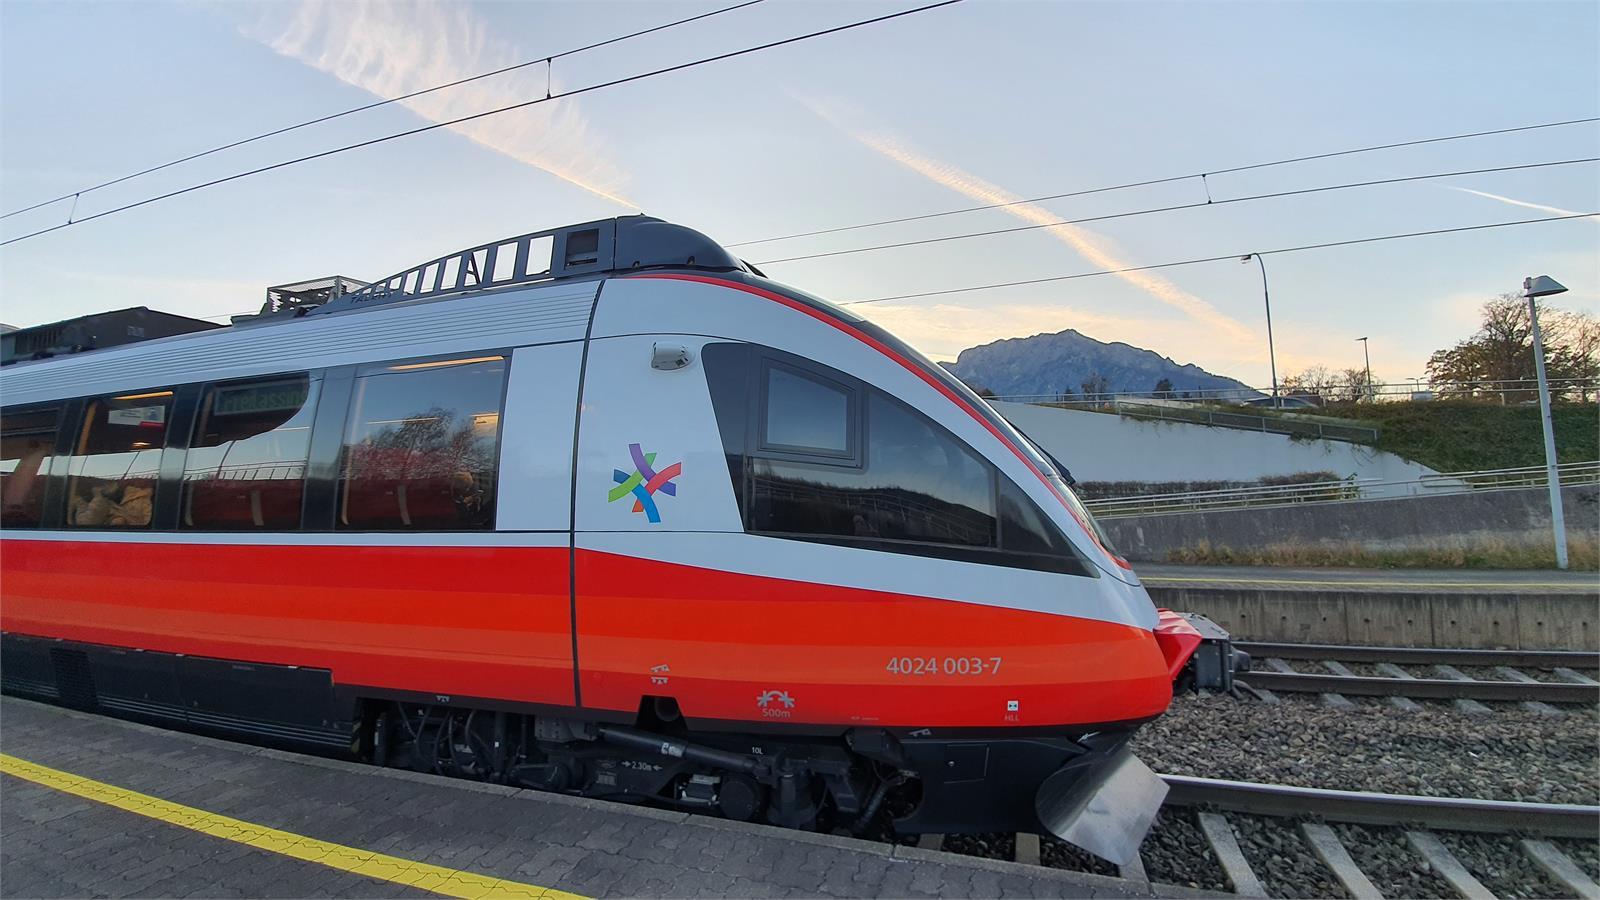 S-Bahn in Puch Urstein | ©TVB Puch - Gerber